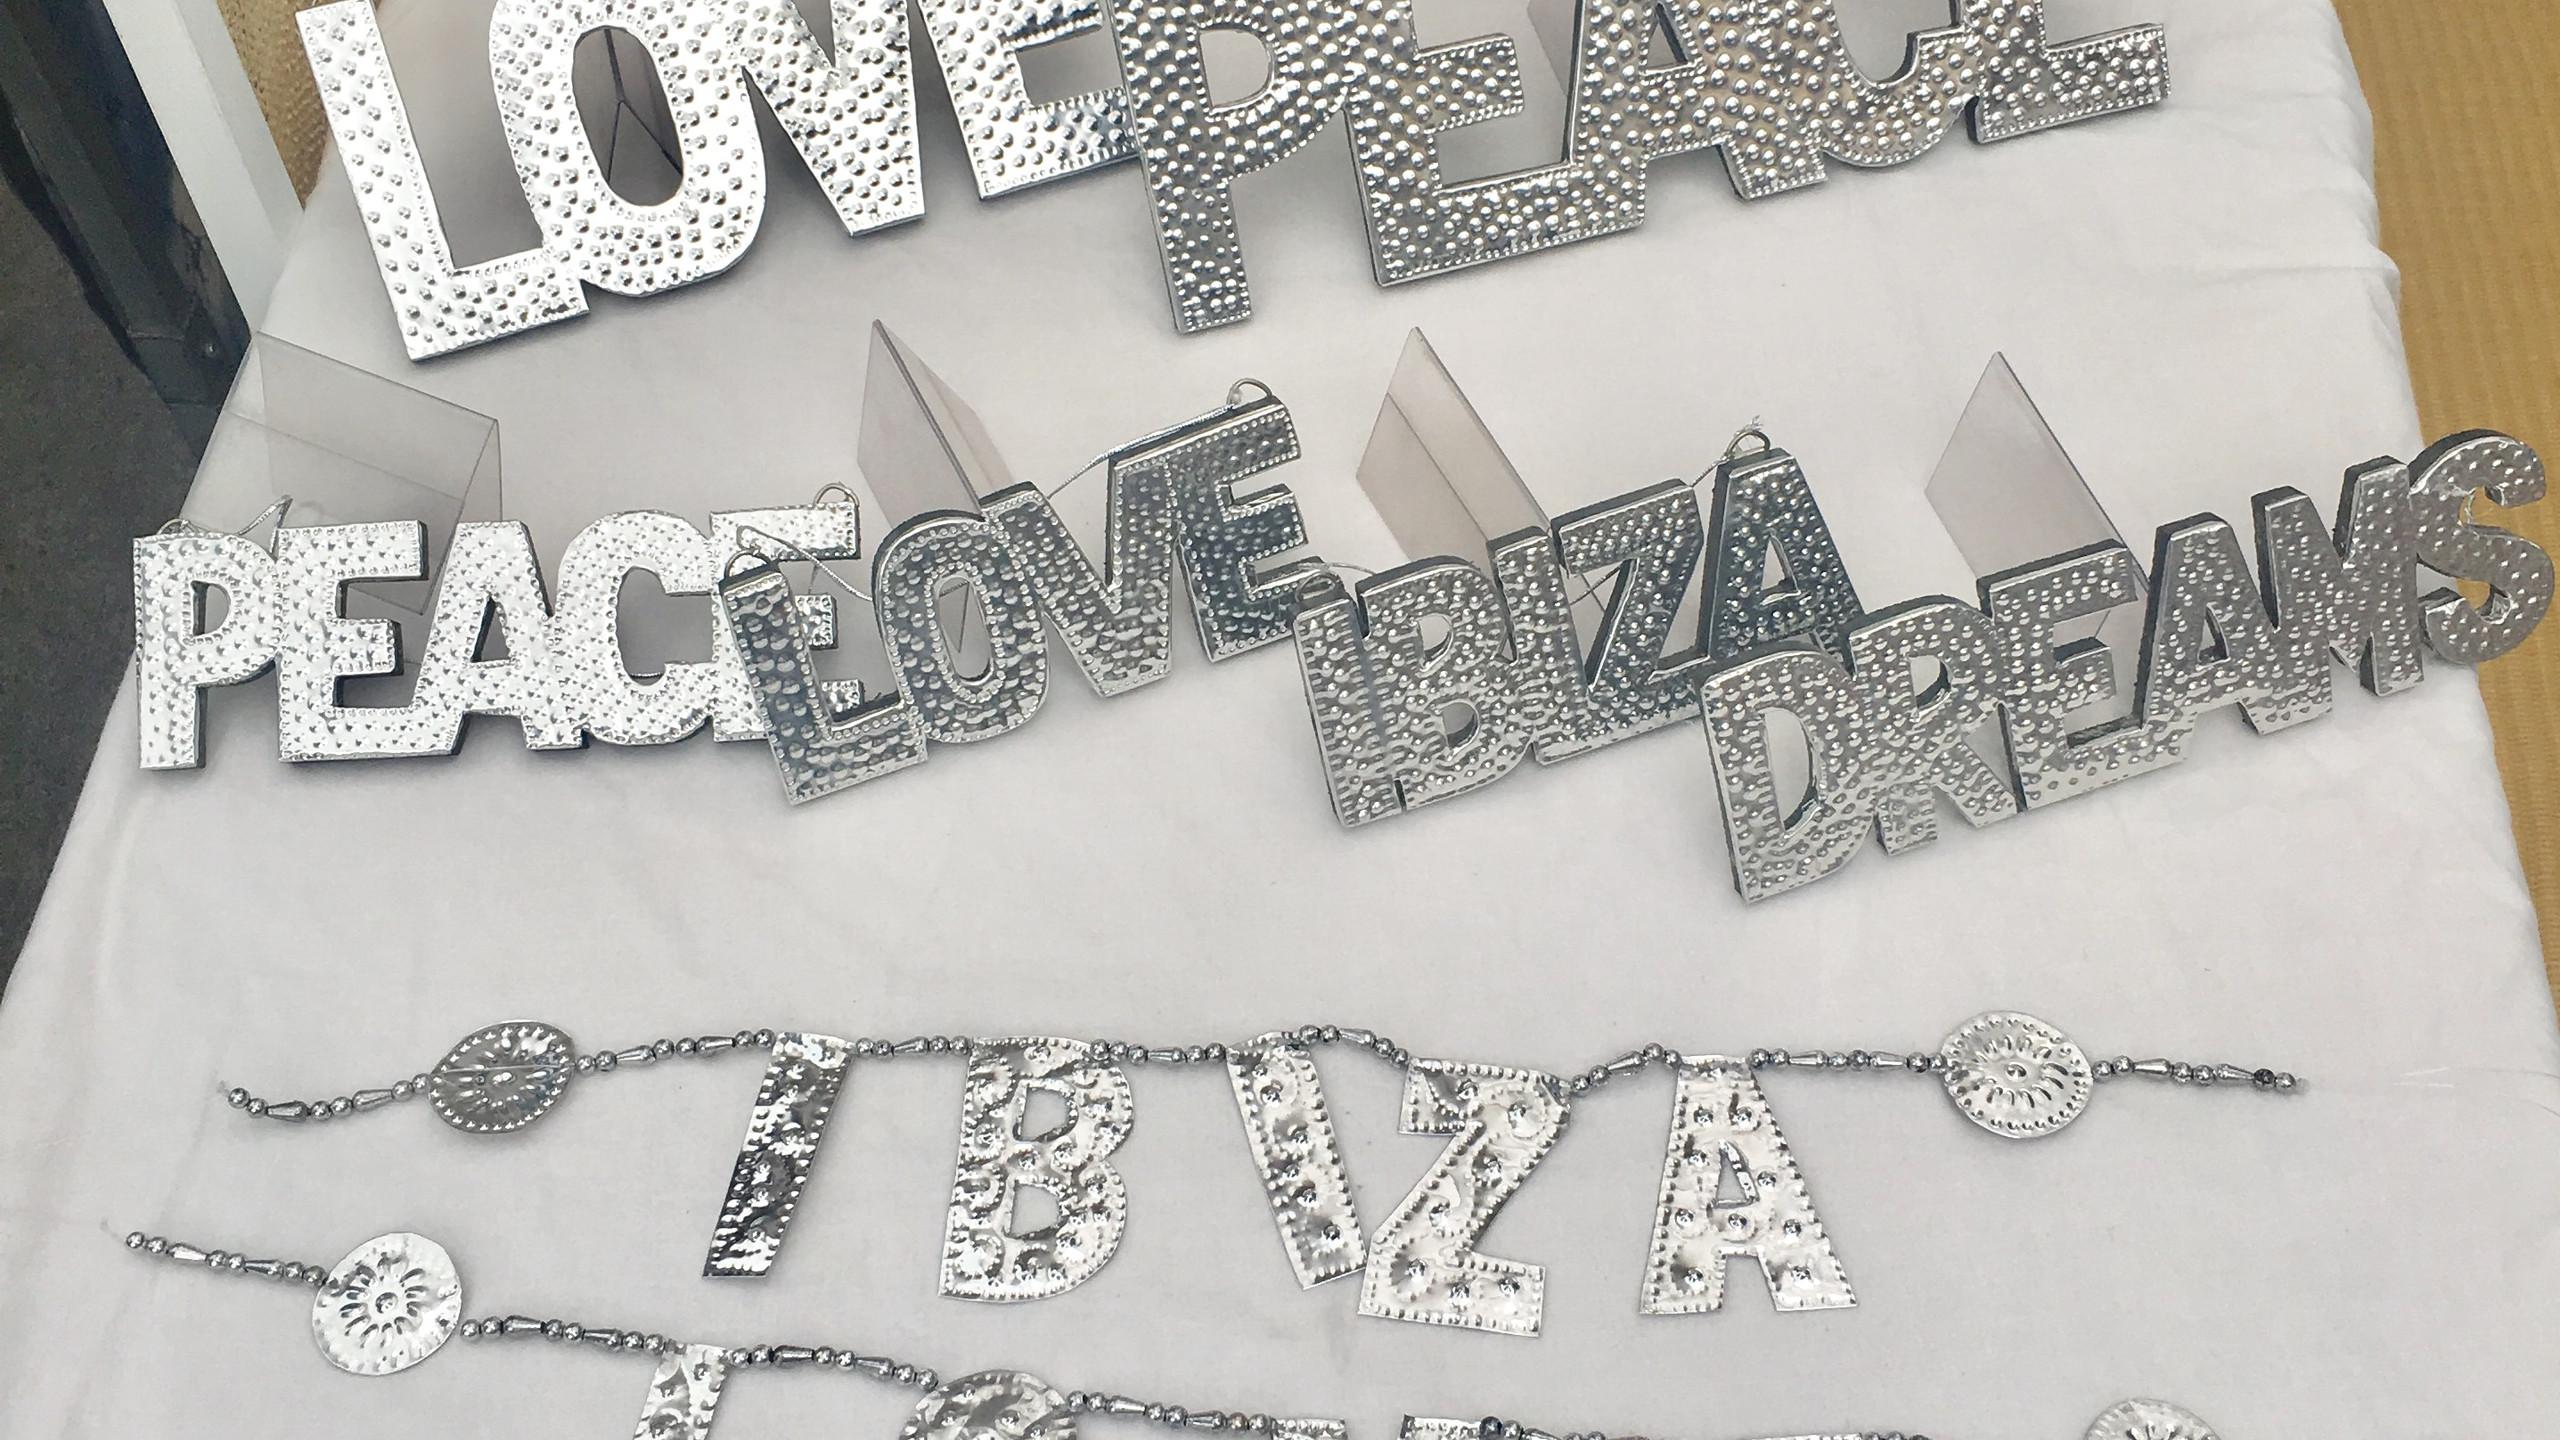 Love. Peace. Ibiza. Dreams.